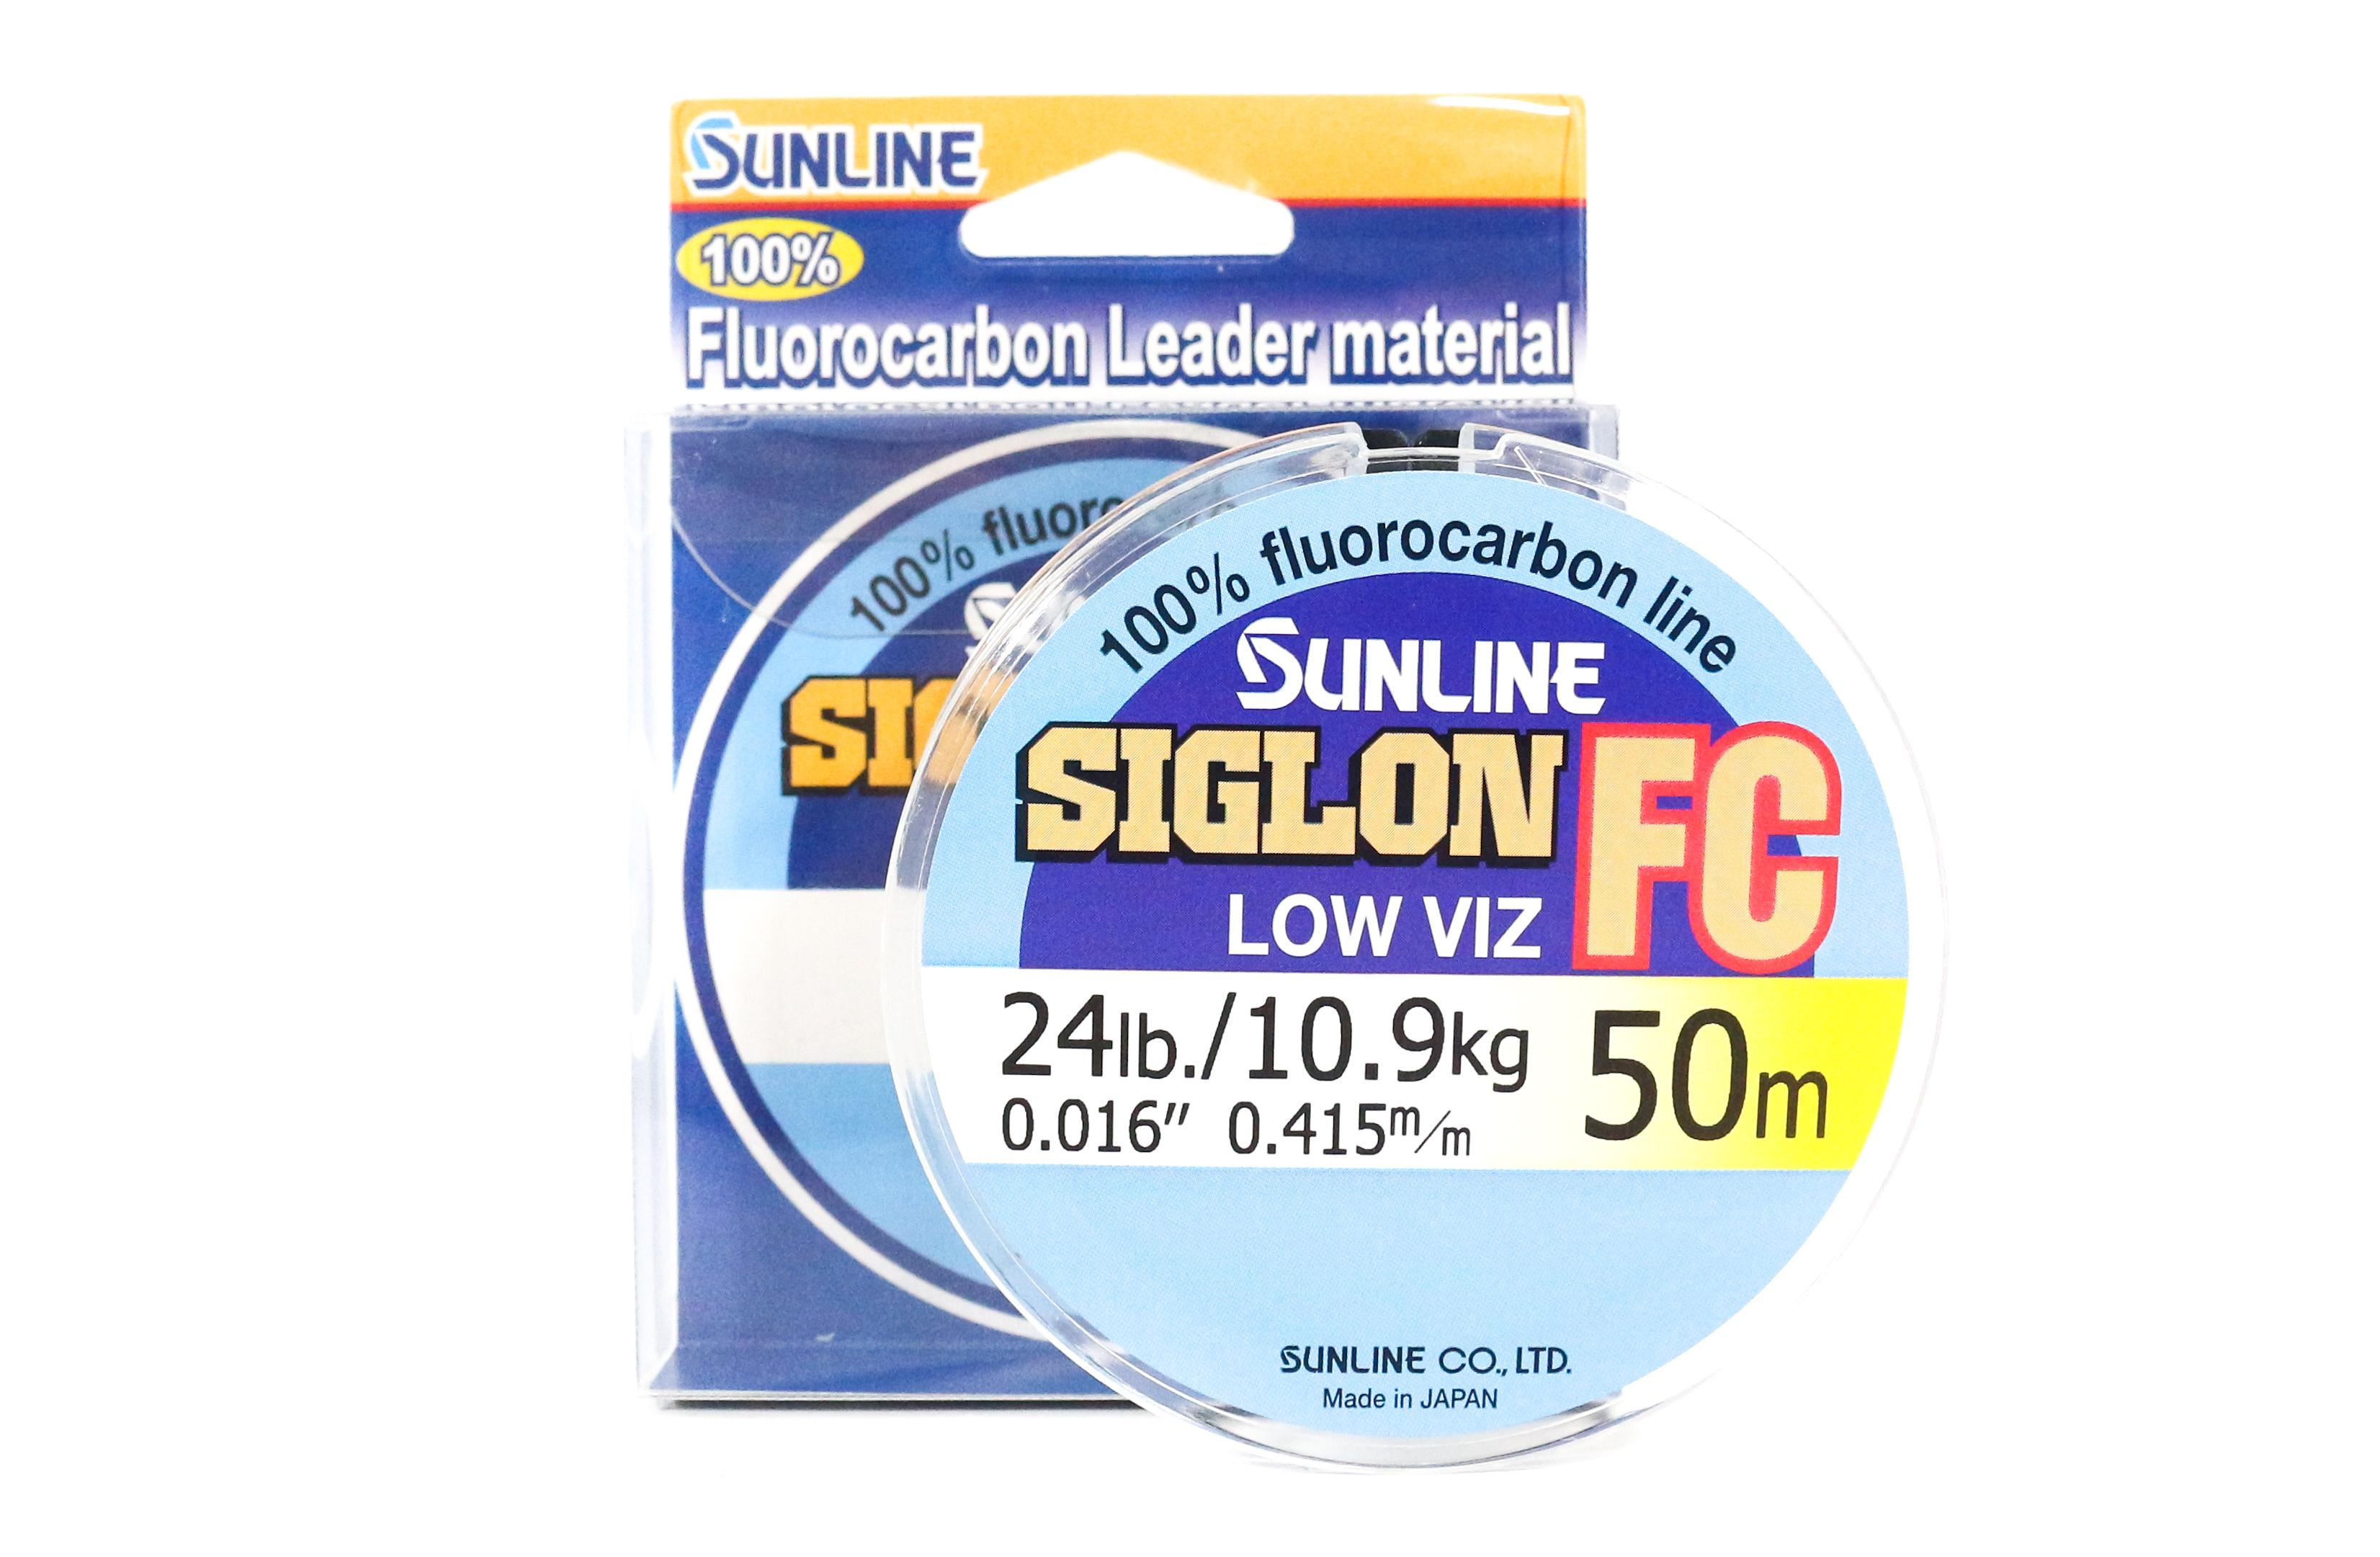 Sunline Siglon FC Fluorocarbon Line 50m 24lb Diameter 0.415 mm (5914)